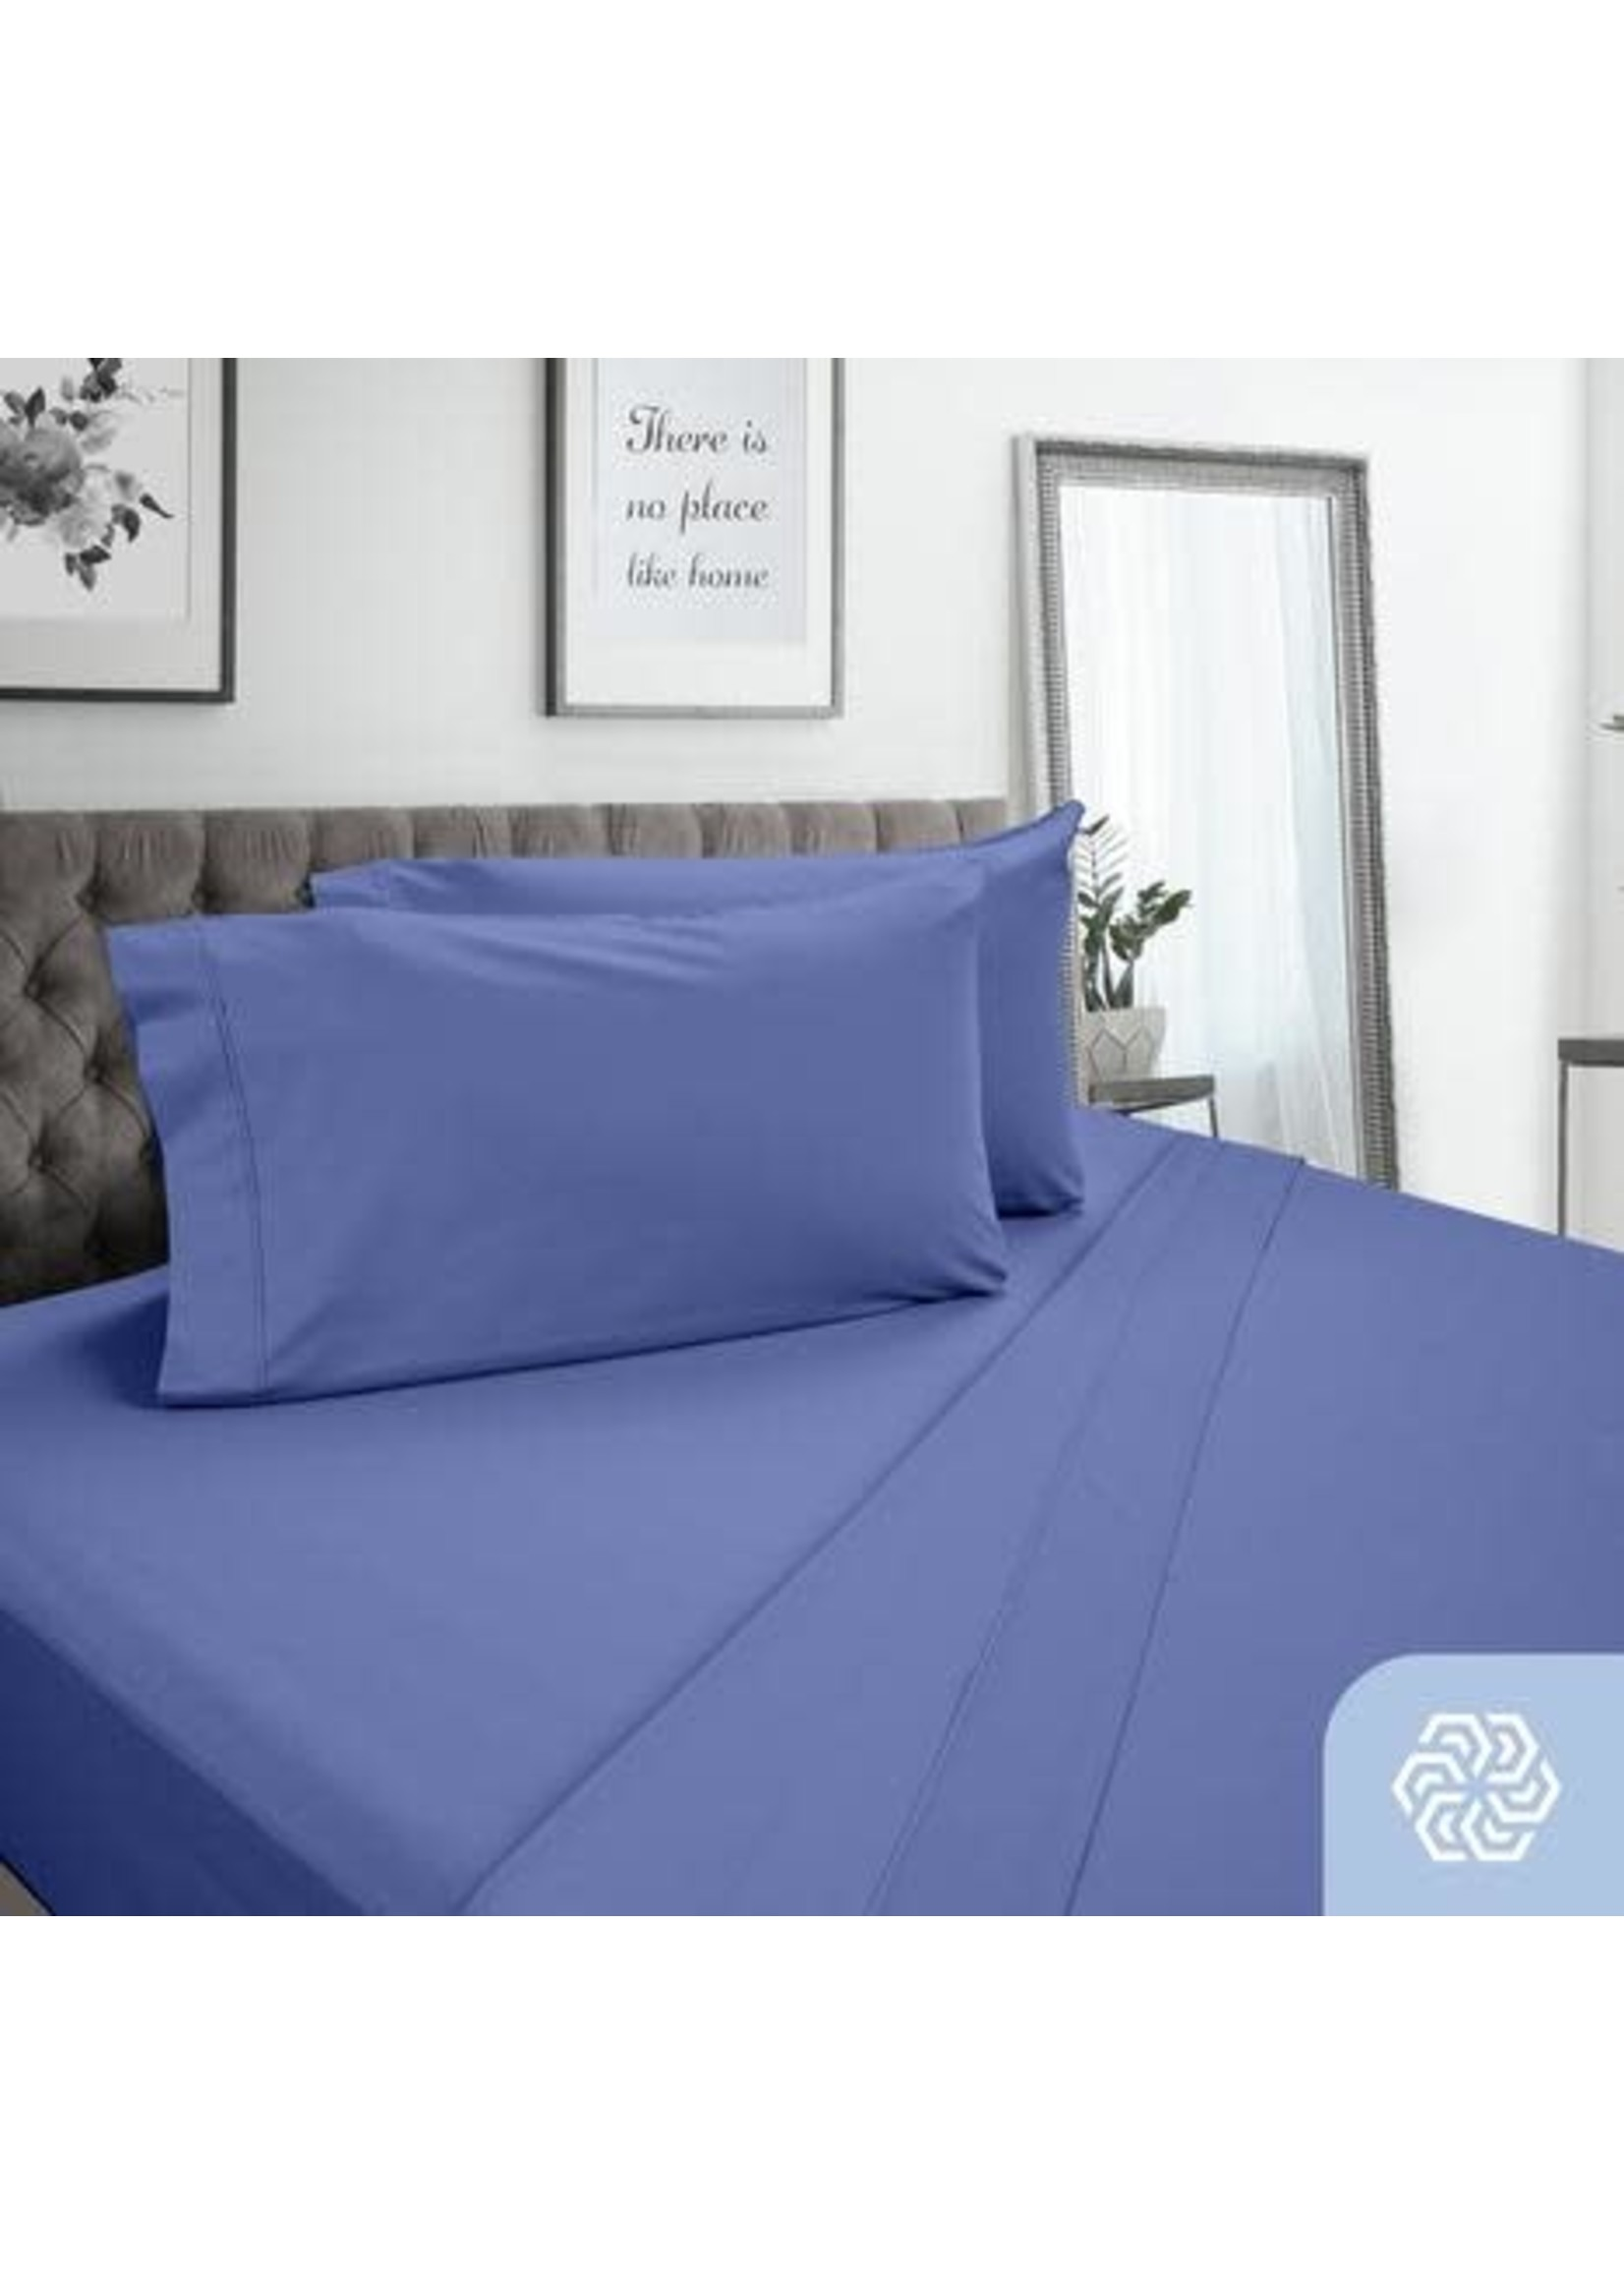 QUEEN , PIMA COTTON SHEETS-BLUE